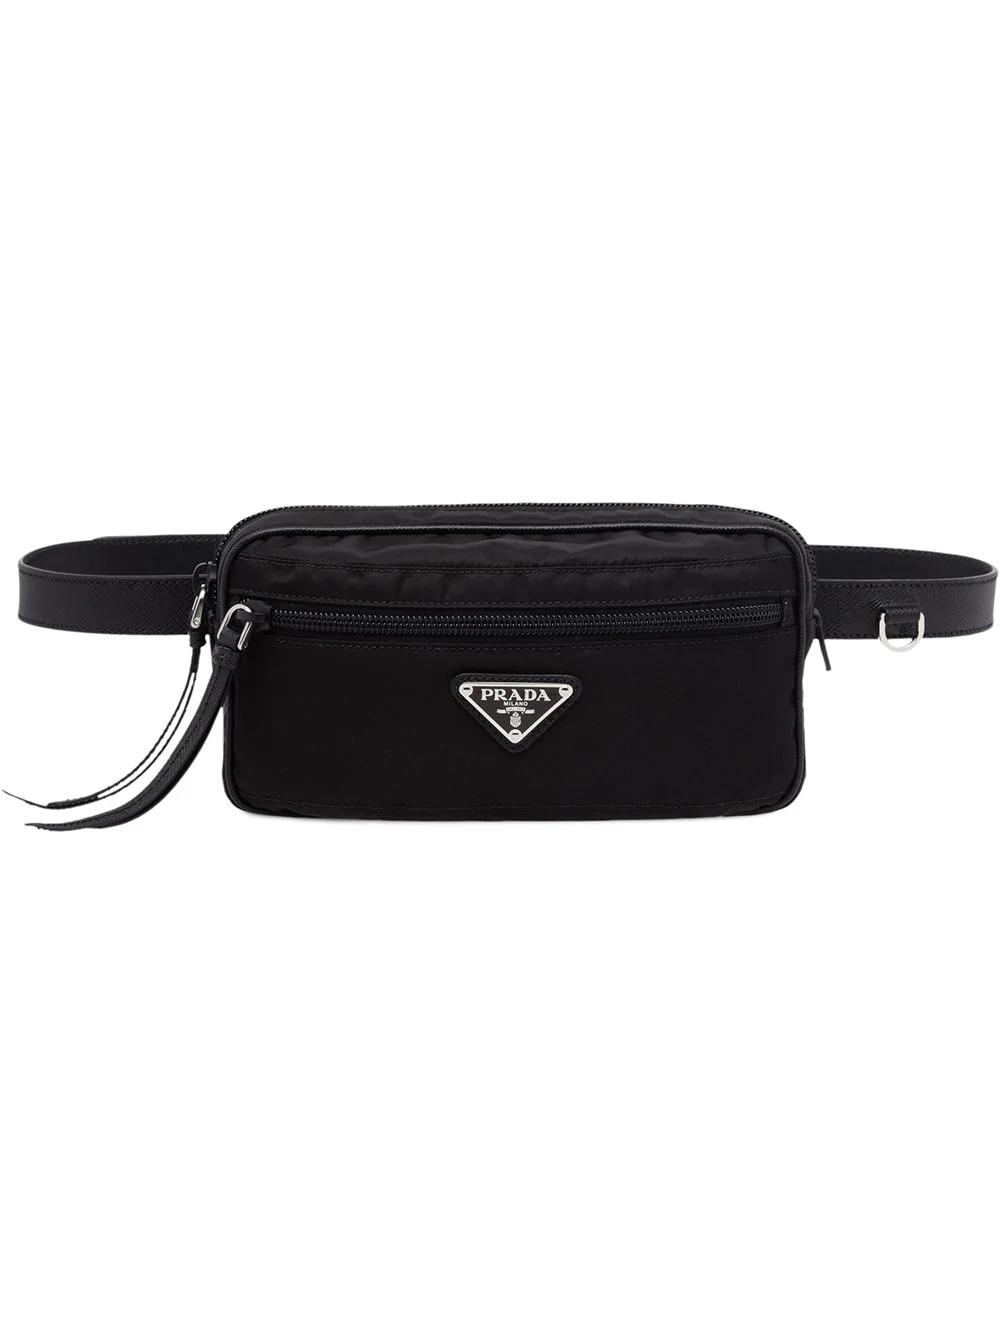 58650c894af8 Prada Fabric And Leather Belt Bag - Black | ModeSens